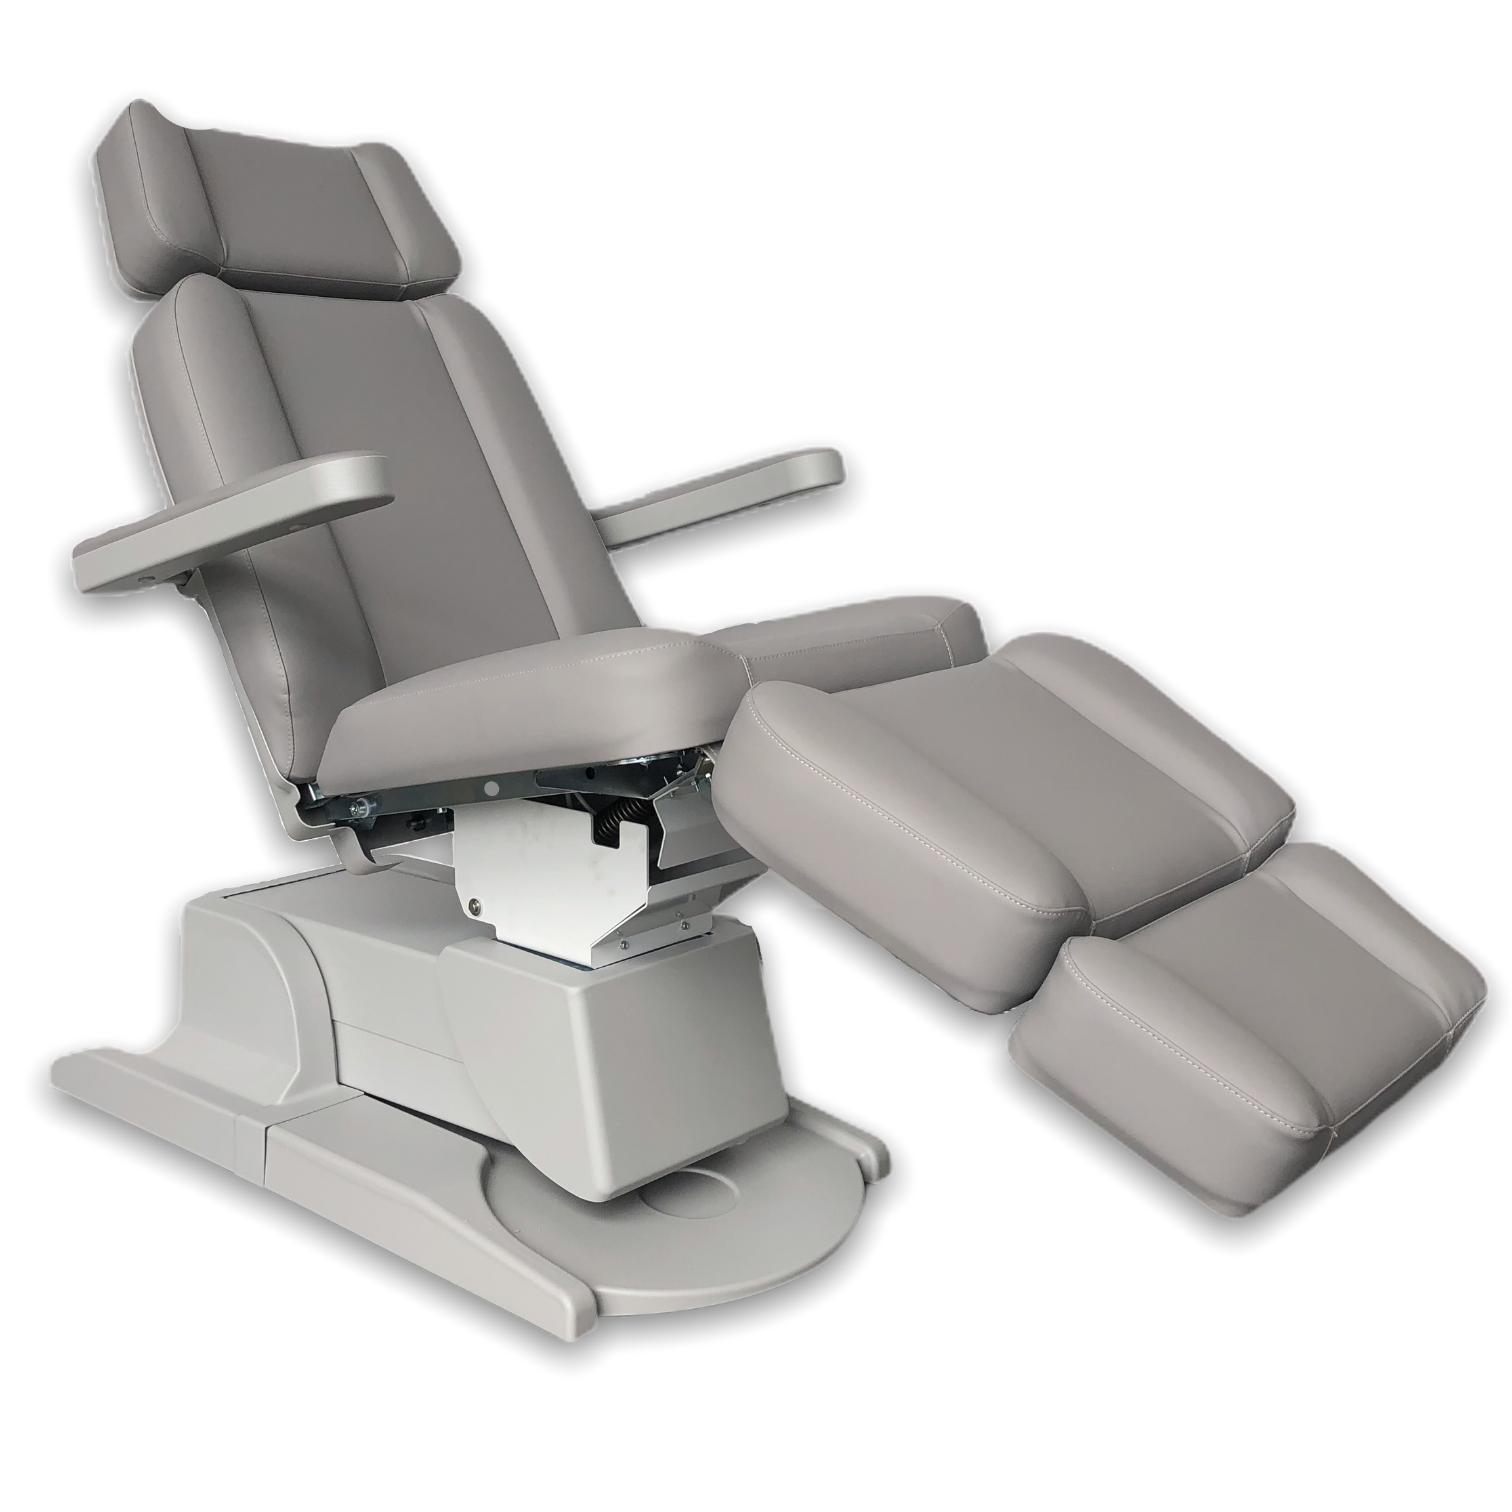 Beauty treatment chair Gray martini beauty 5